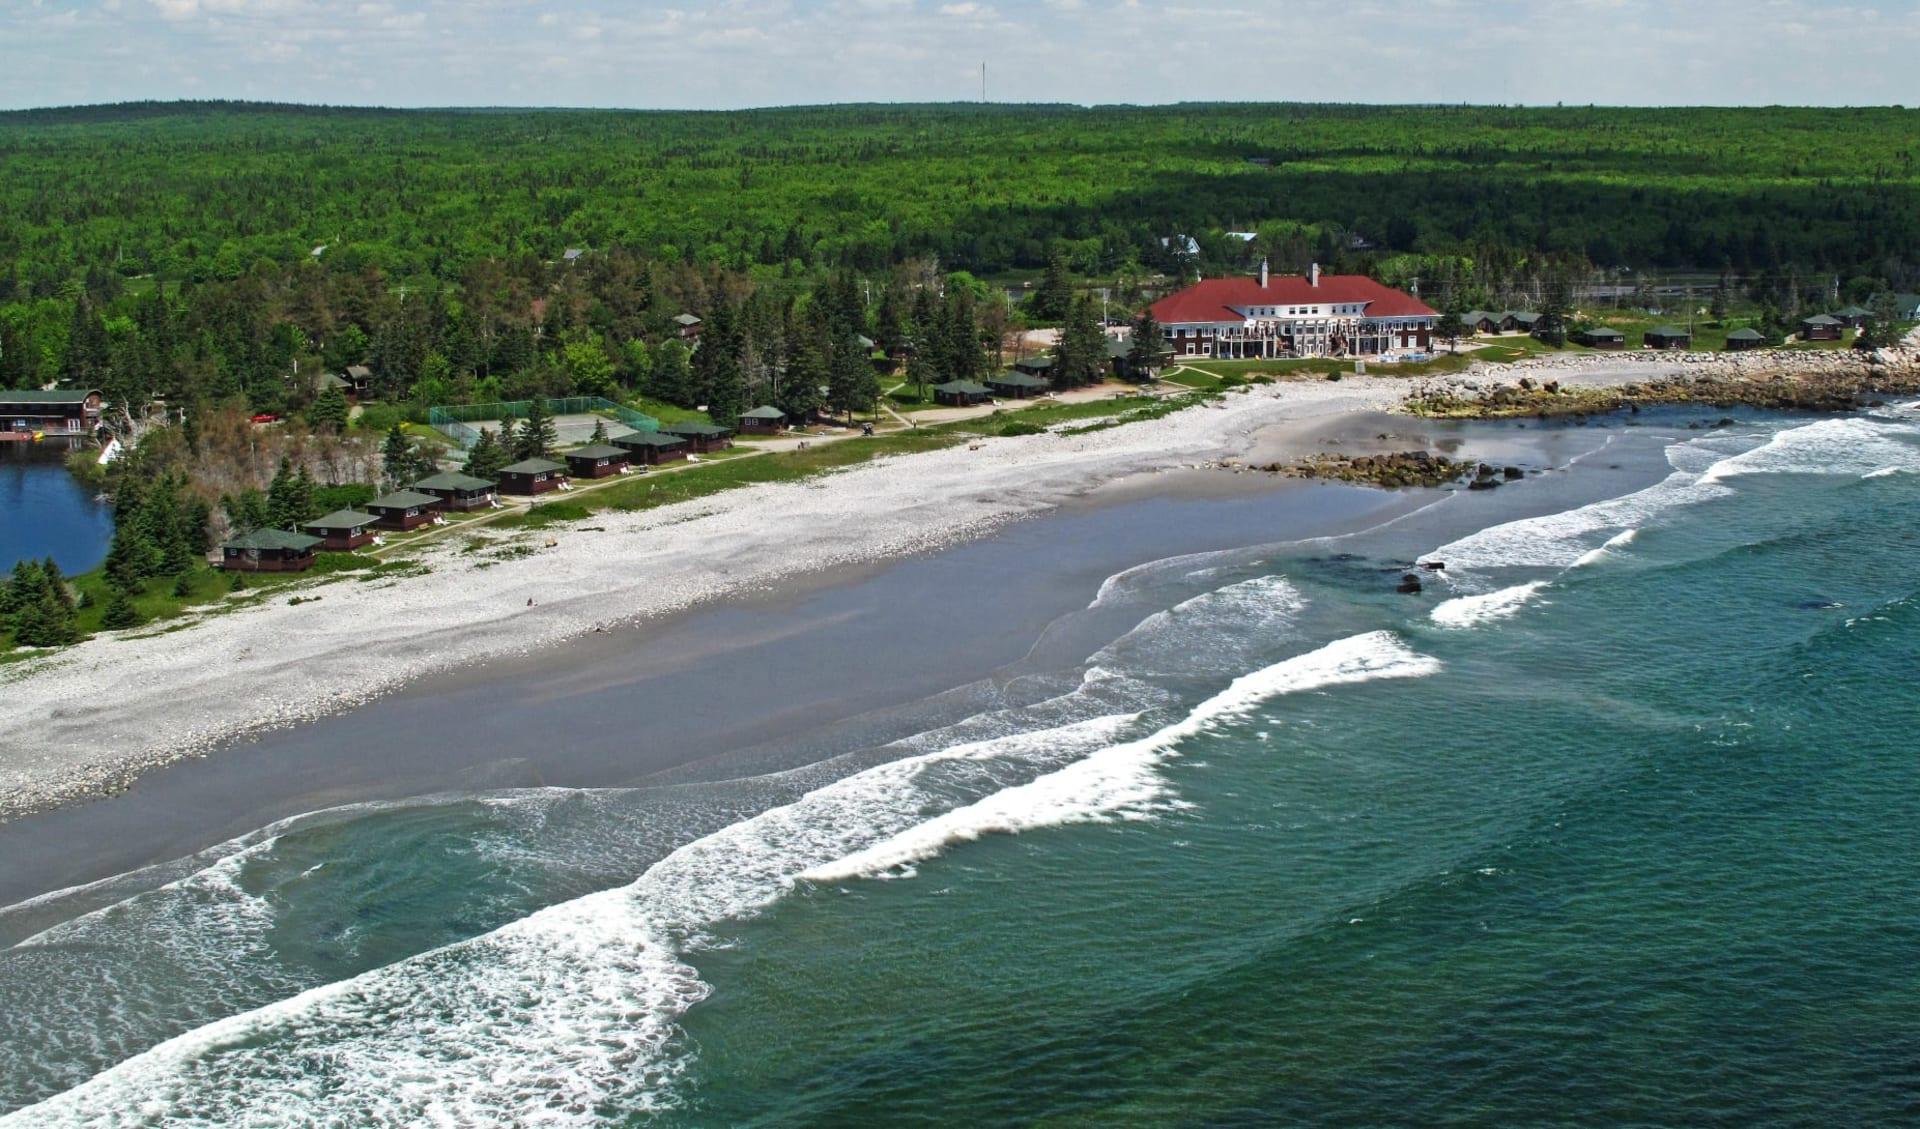 White Point Beach Resort:  WhitePointAreal